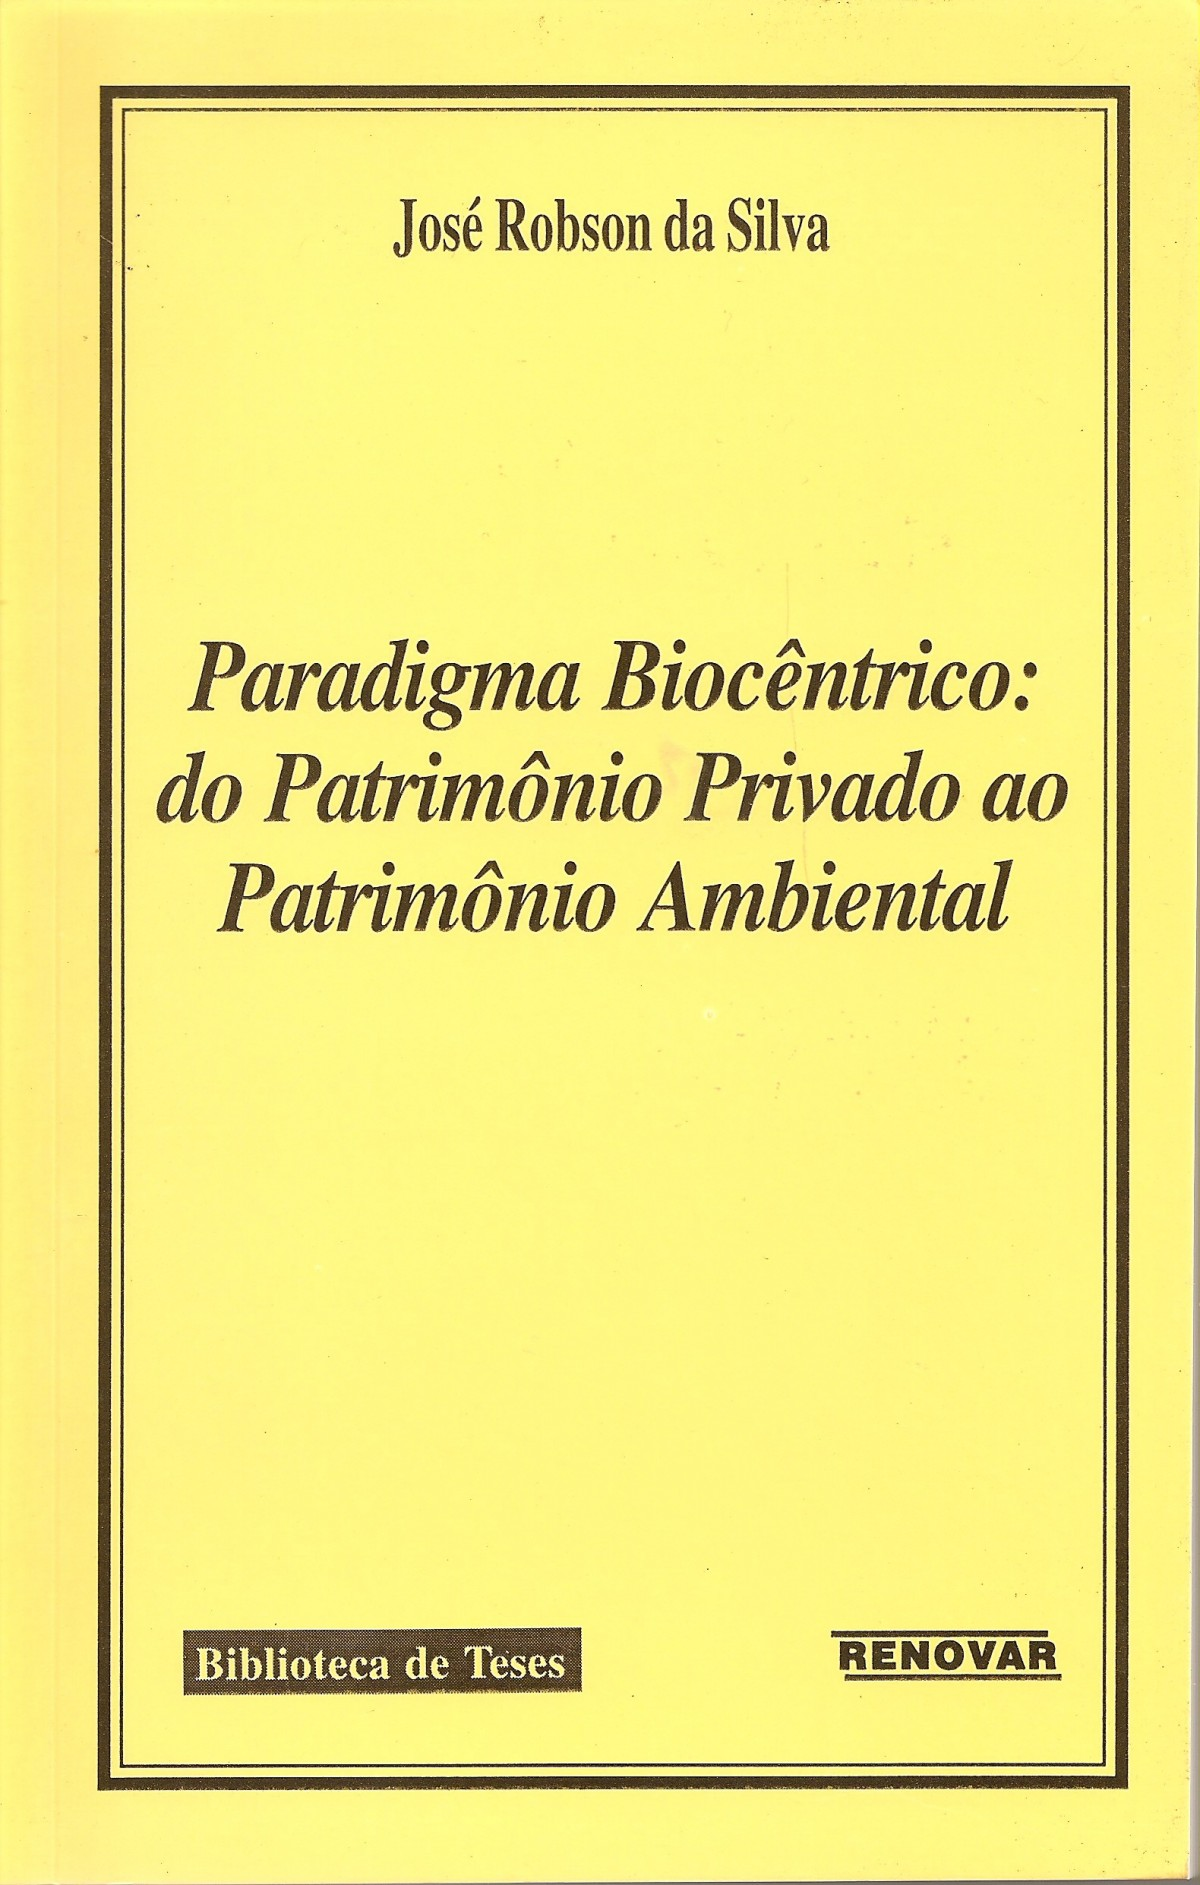 Foto 1 - Paradigma Biocêntrico: Do Patrimônio Privado ao Patrimônio Ambiental